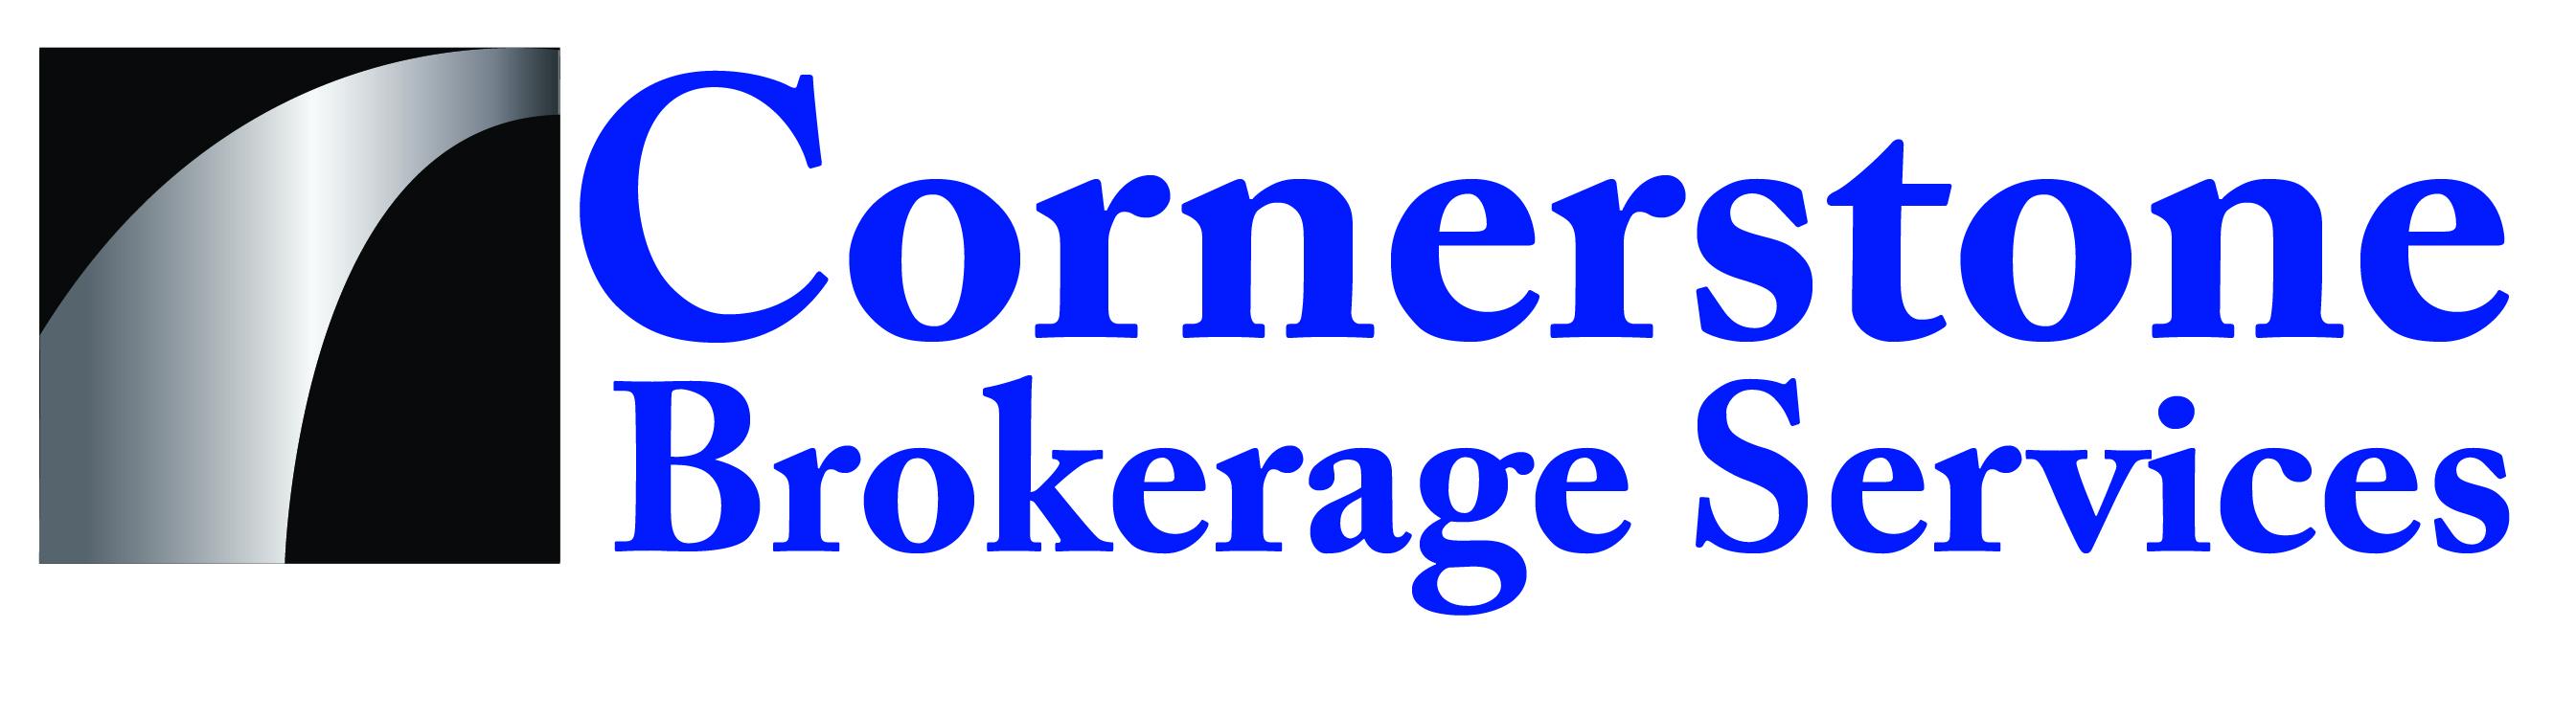 Cornerstone Brokerage Services